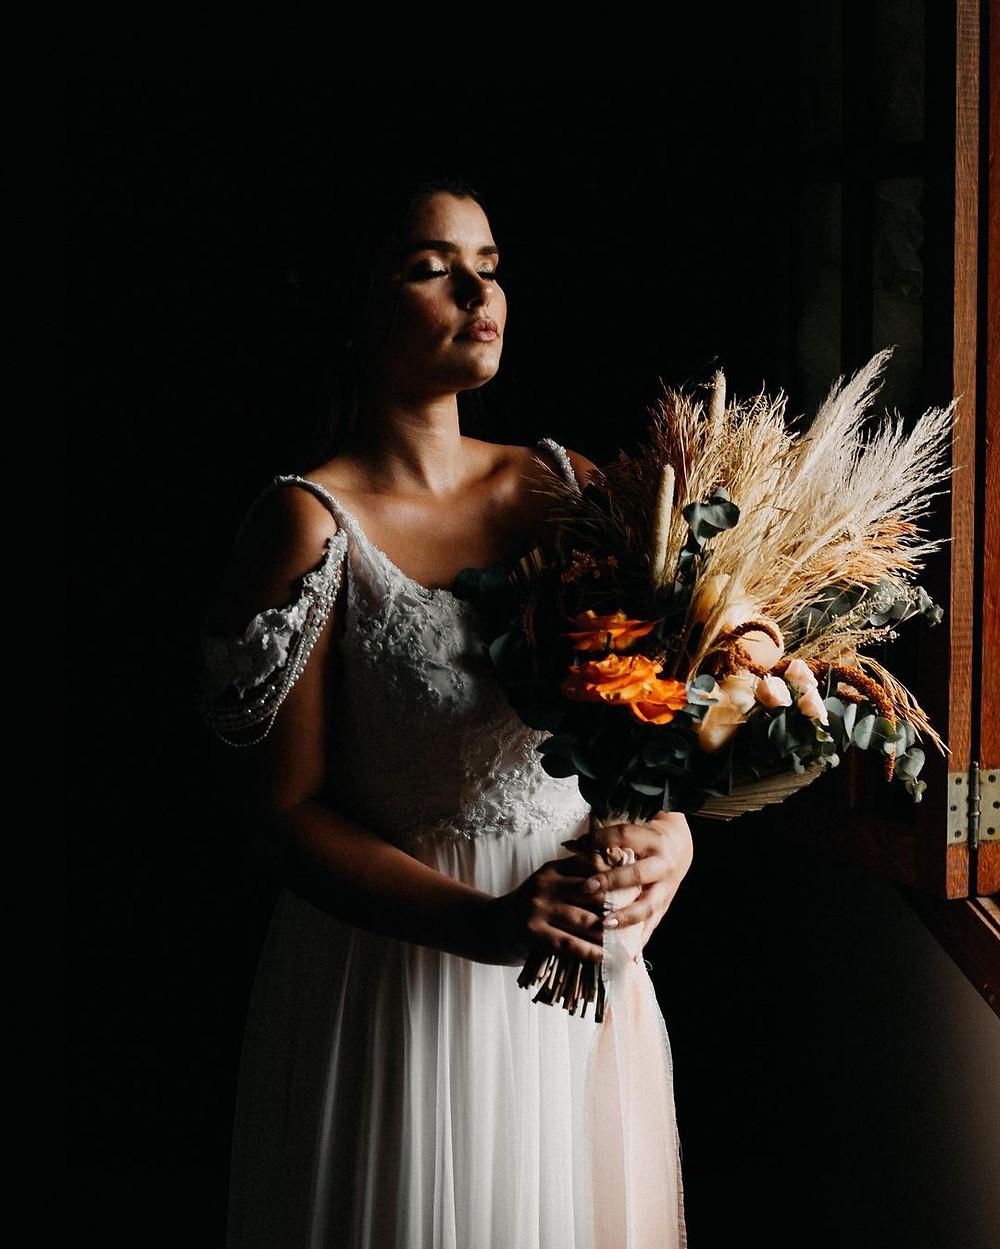 Vestido de noiva: Maison Delorée   Foto: Indio Silva